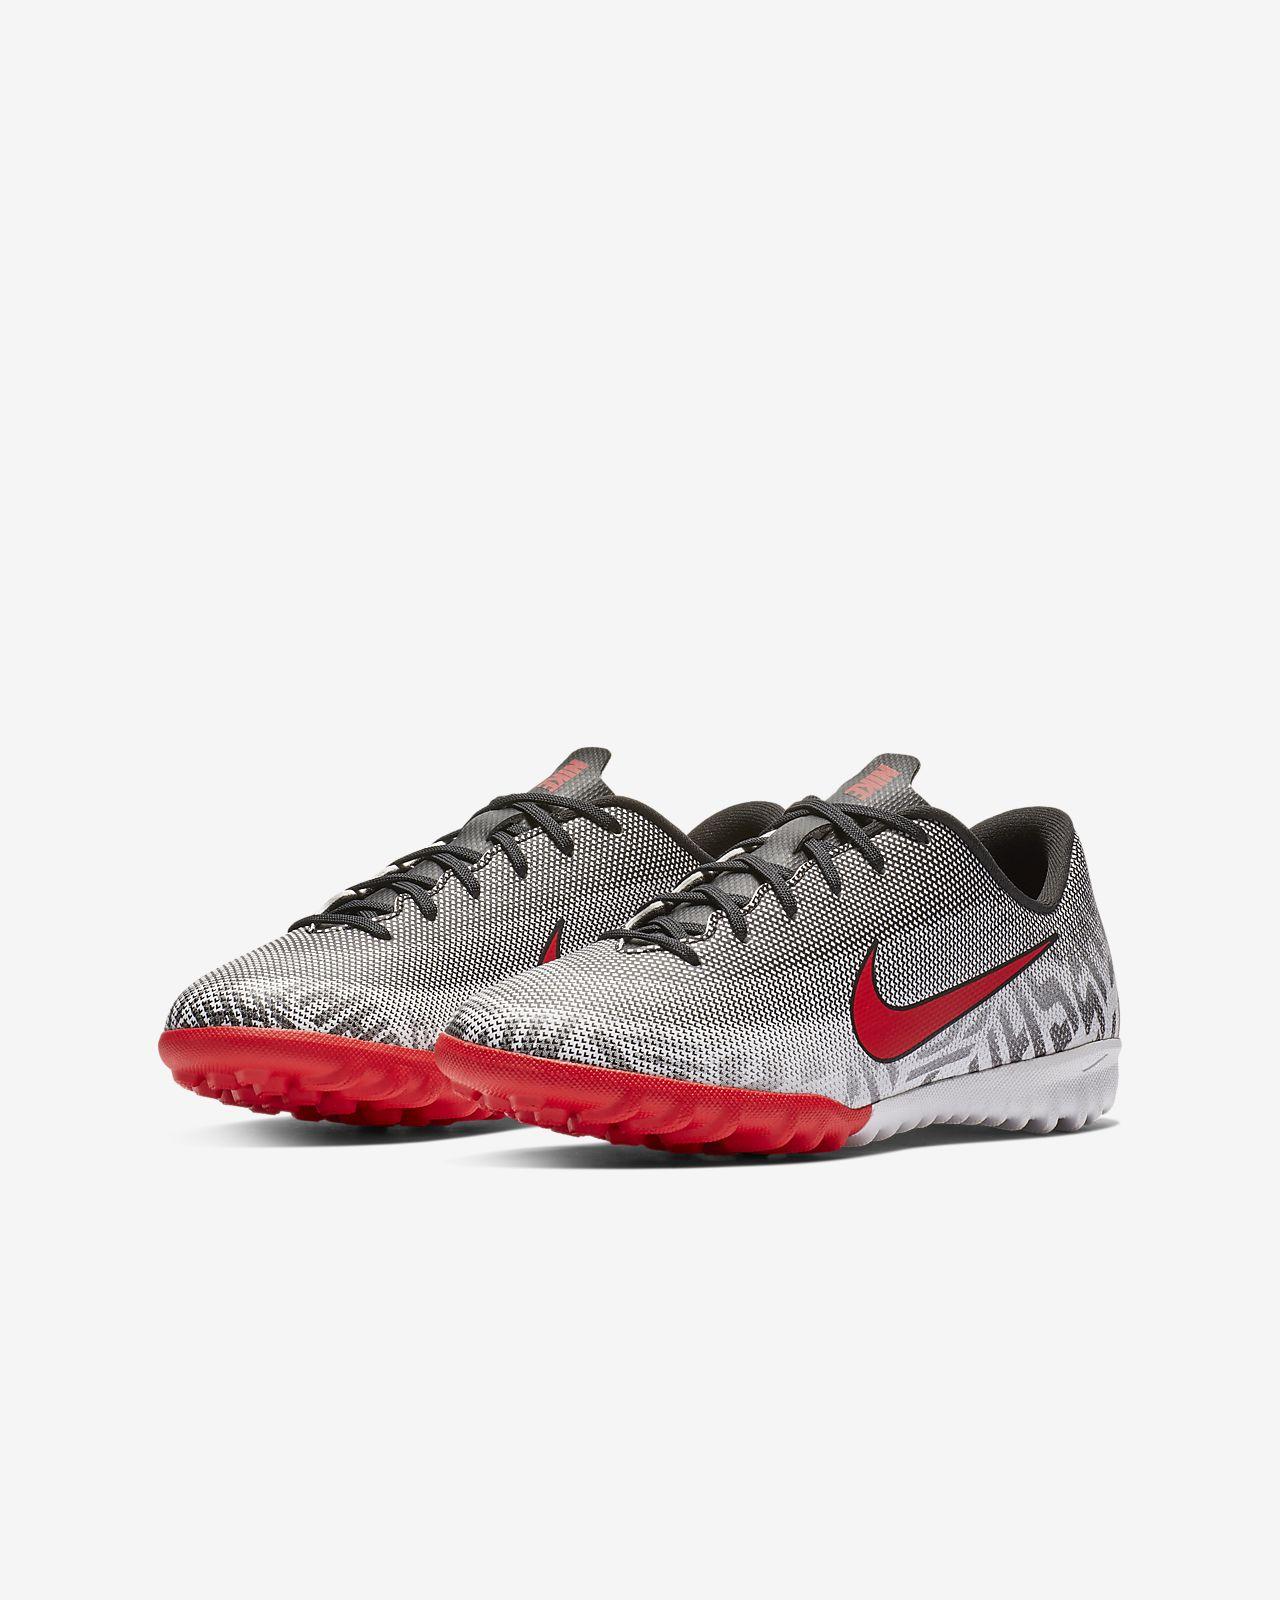 484cc447597 ... Nike Jr. Mercurial Vapor XII Academy Neymar Jr Botas de fútbol para  hierba artificial o